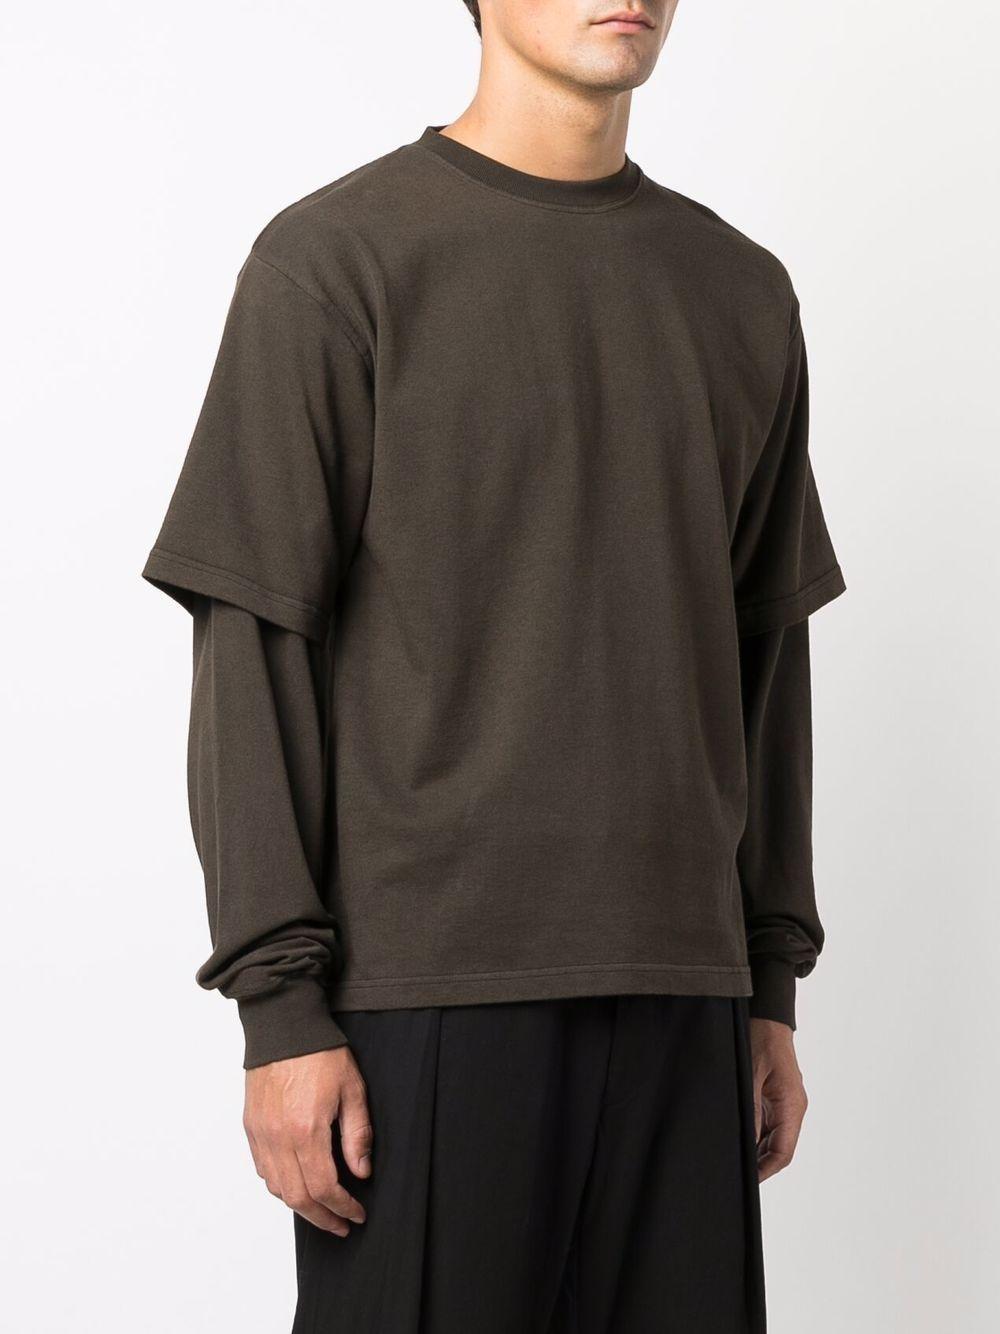 t-shirt a maniche lunghe uomo marrone in cotone GR10K | T-shirt | GR4A2JZSOIL BROWN